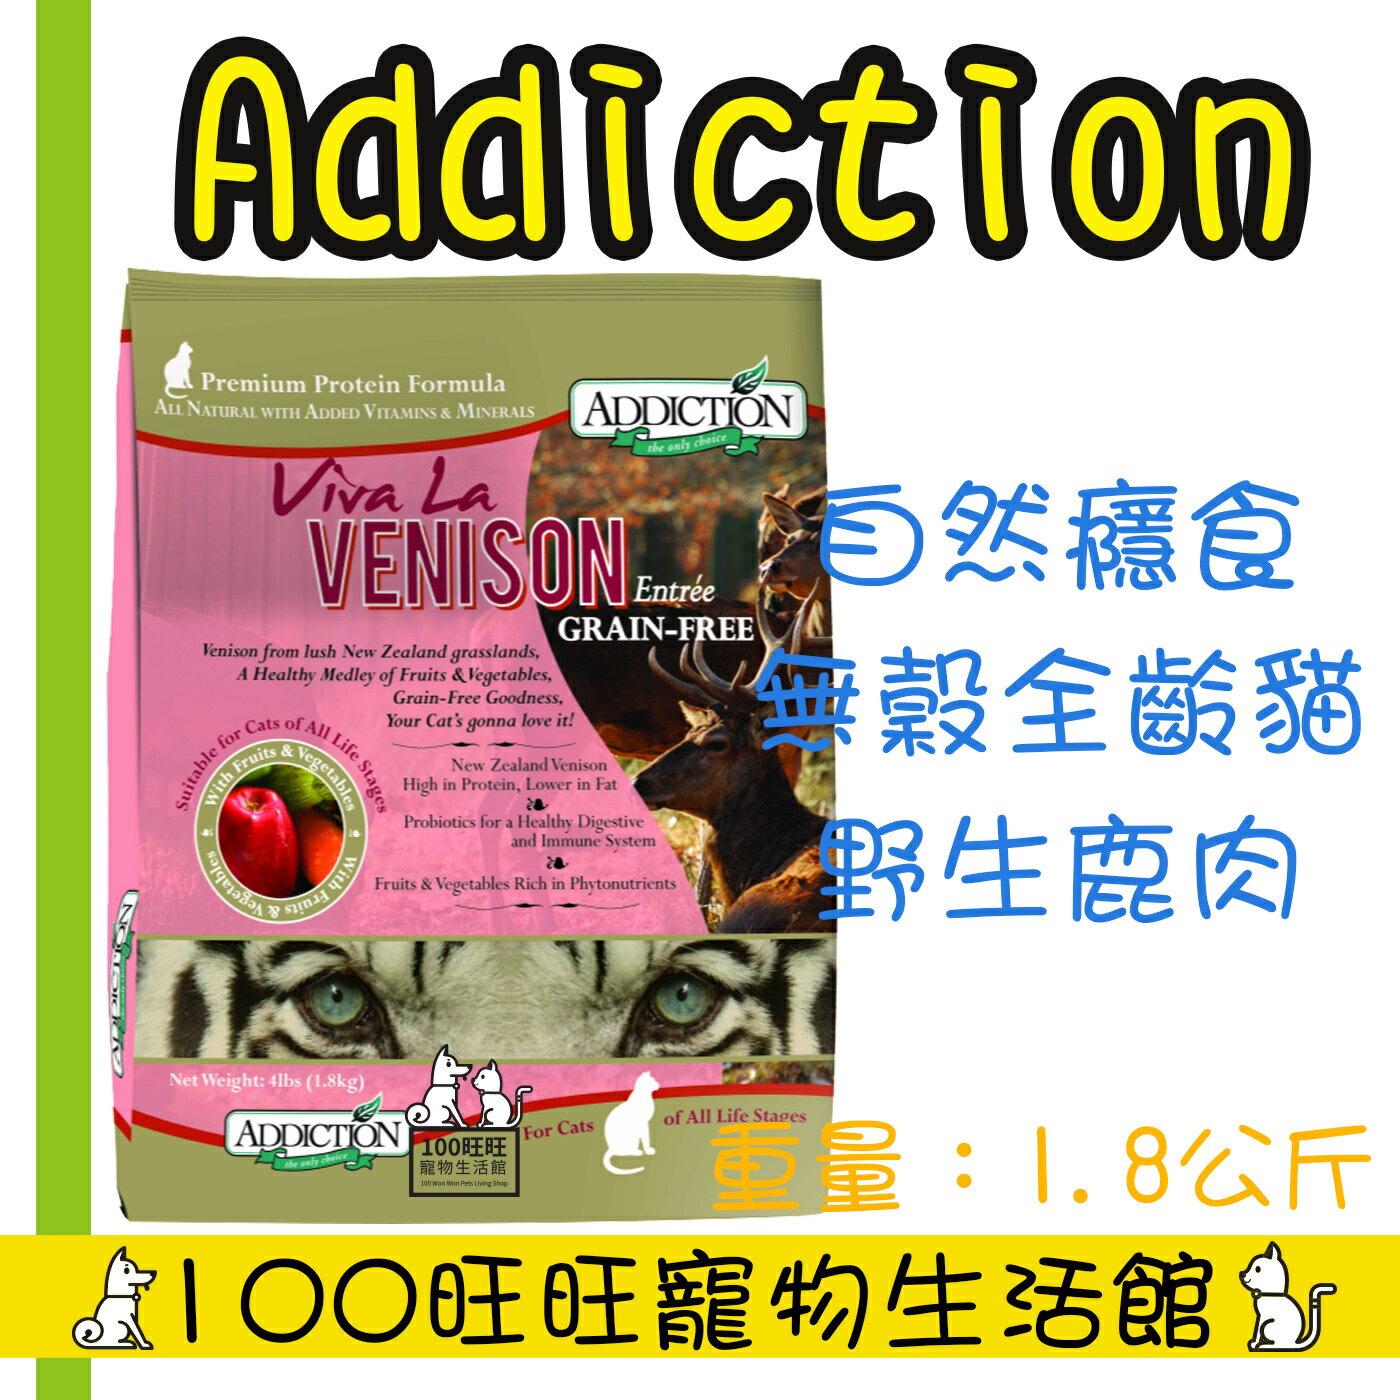 Addiction自然癮食 無穀鹿肉貓寵食 貓糧 1.8公斤